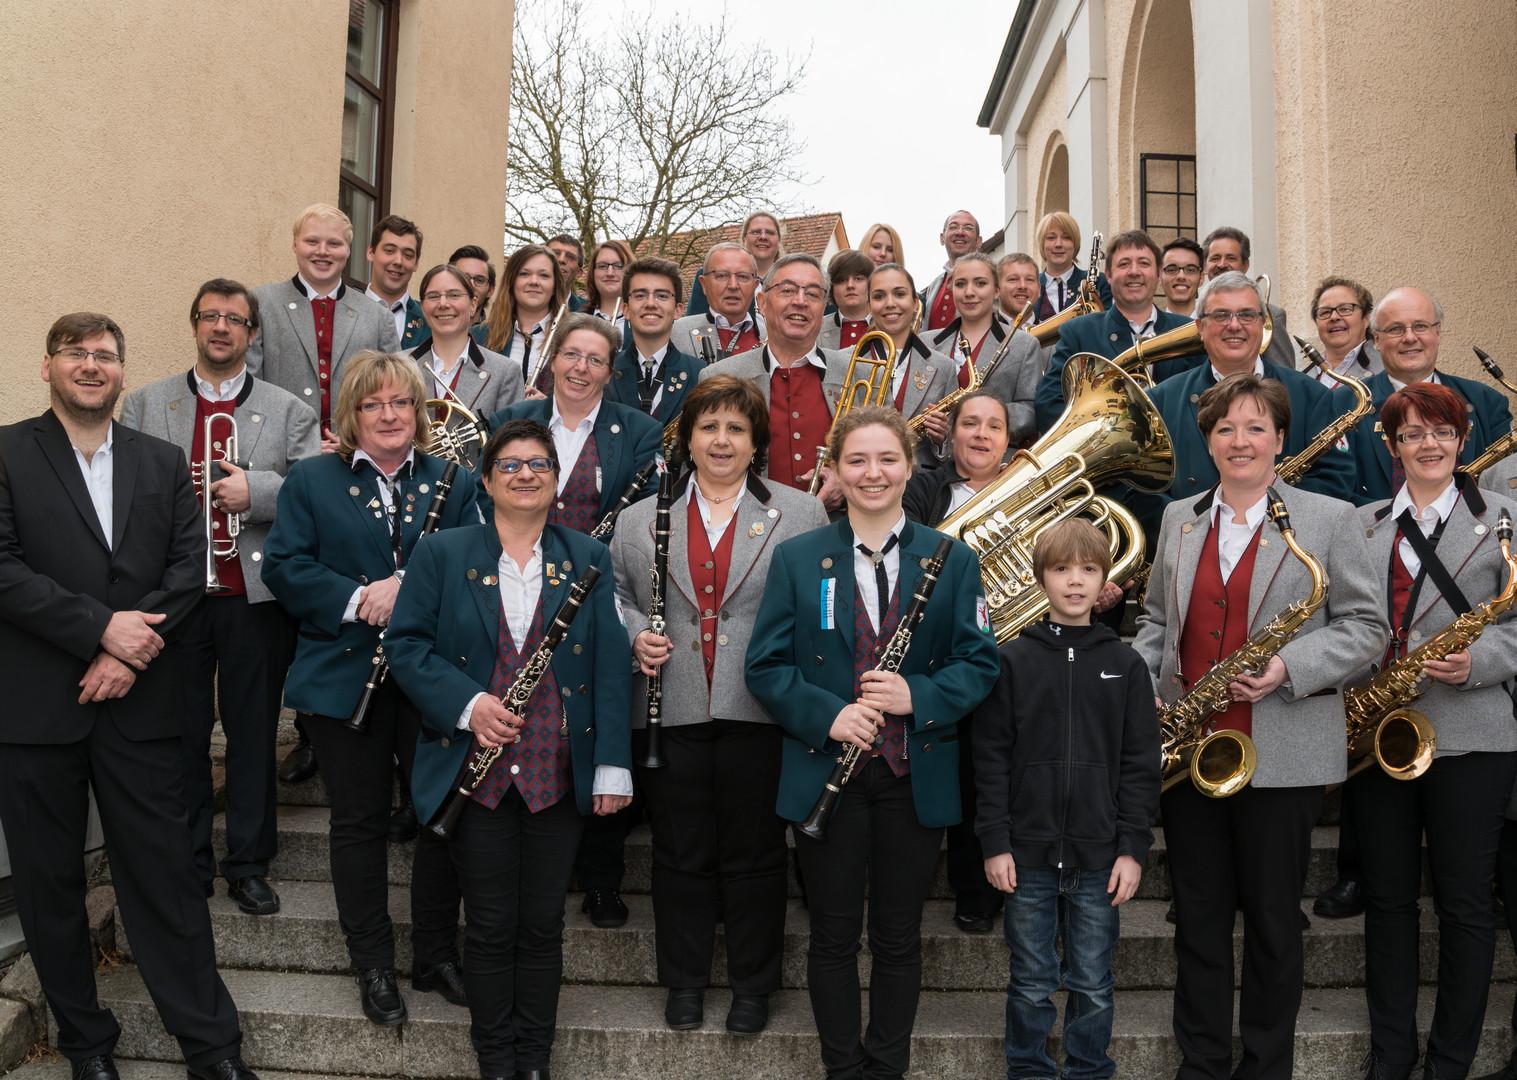 Spielgemeinschaft Musikverein Börtlingen/Rechberghausen